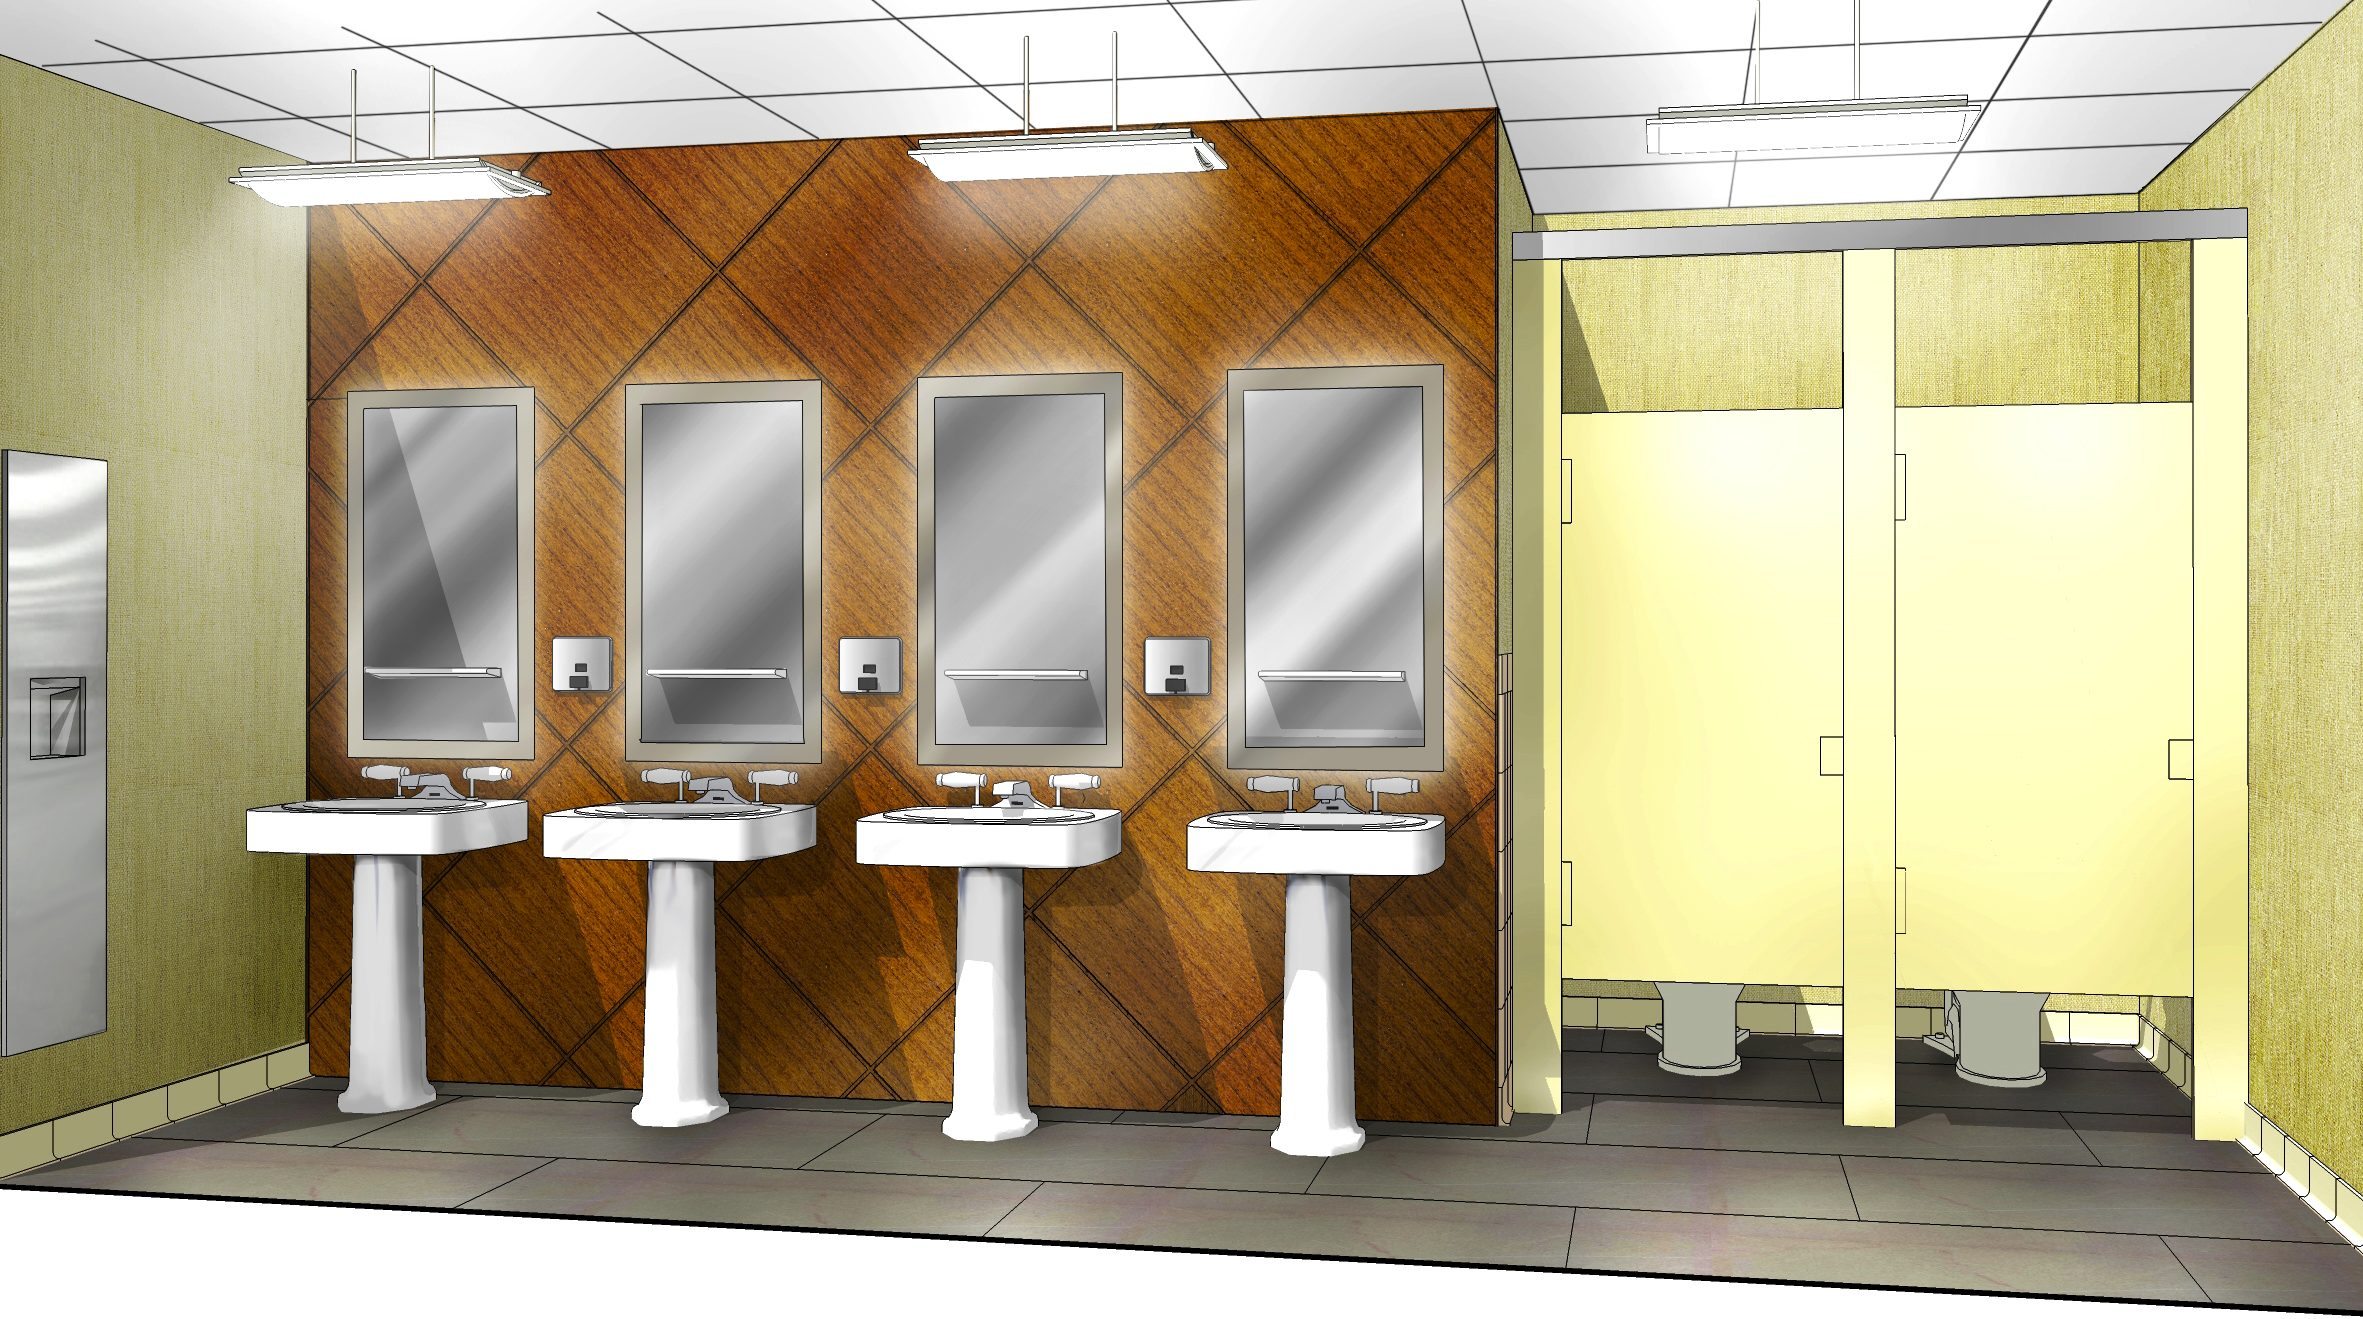 Men's Washroom - Proposed